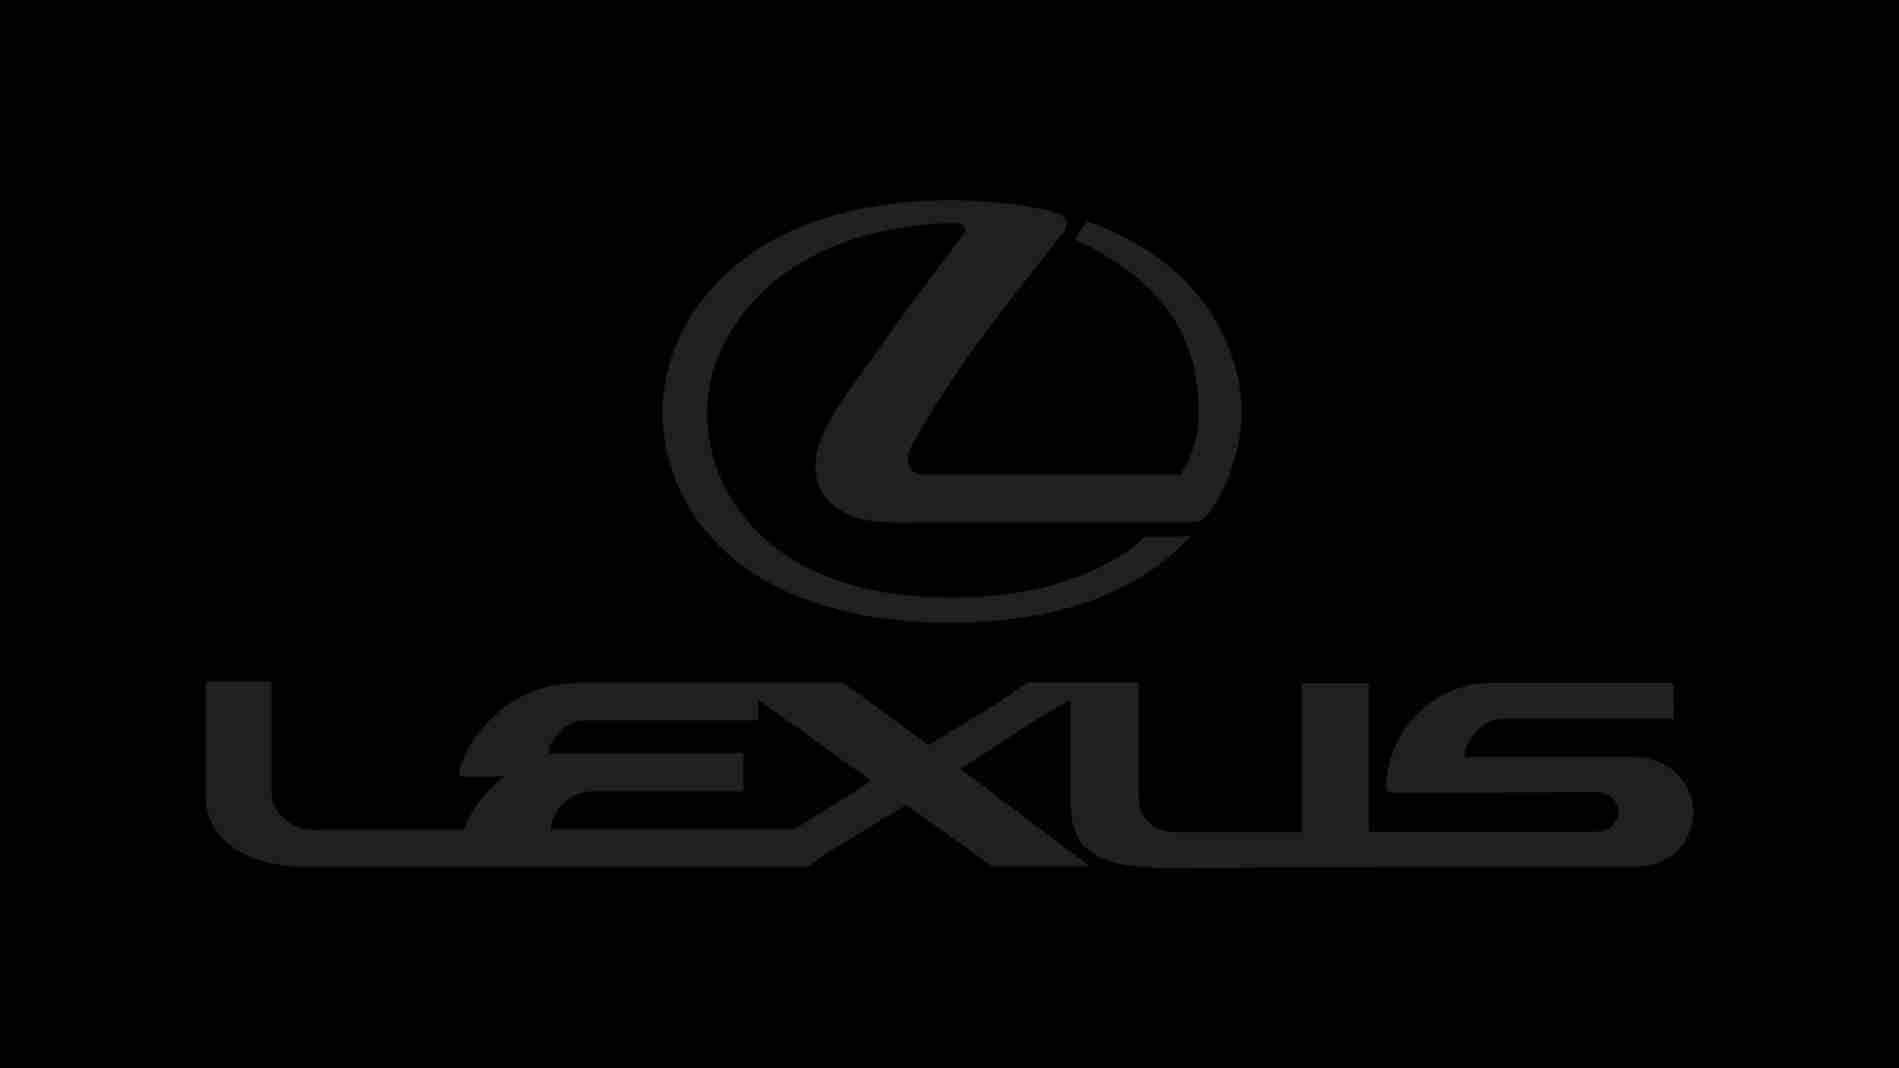 Lexus Logo Wallpapers Wallpaper Cave